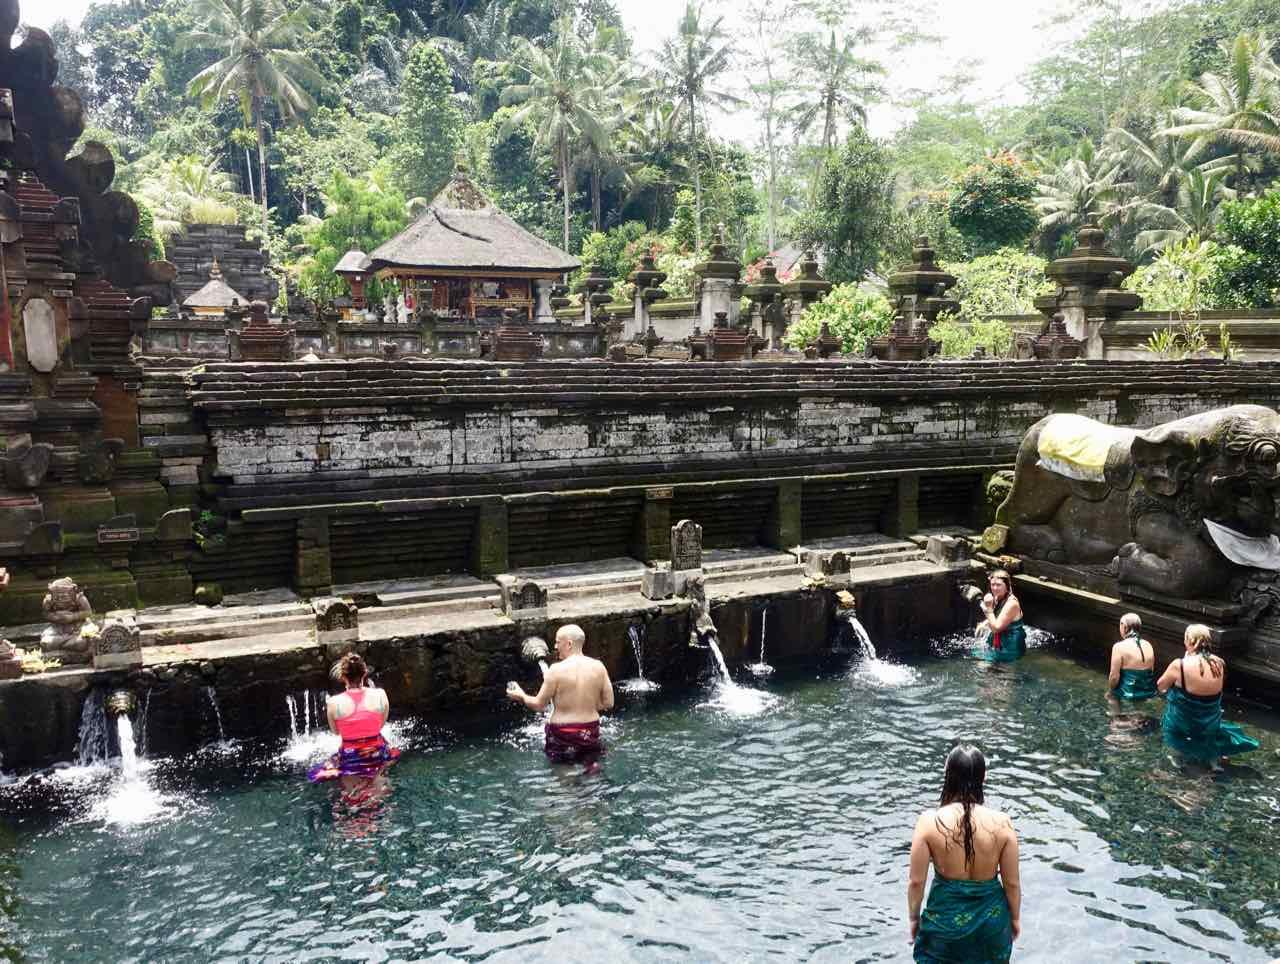 Tirta Empul Tempel, Wallfahrtsort auf Bali Titelbild, ©PetersTravel